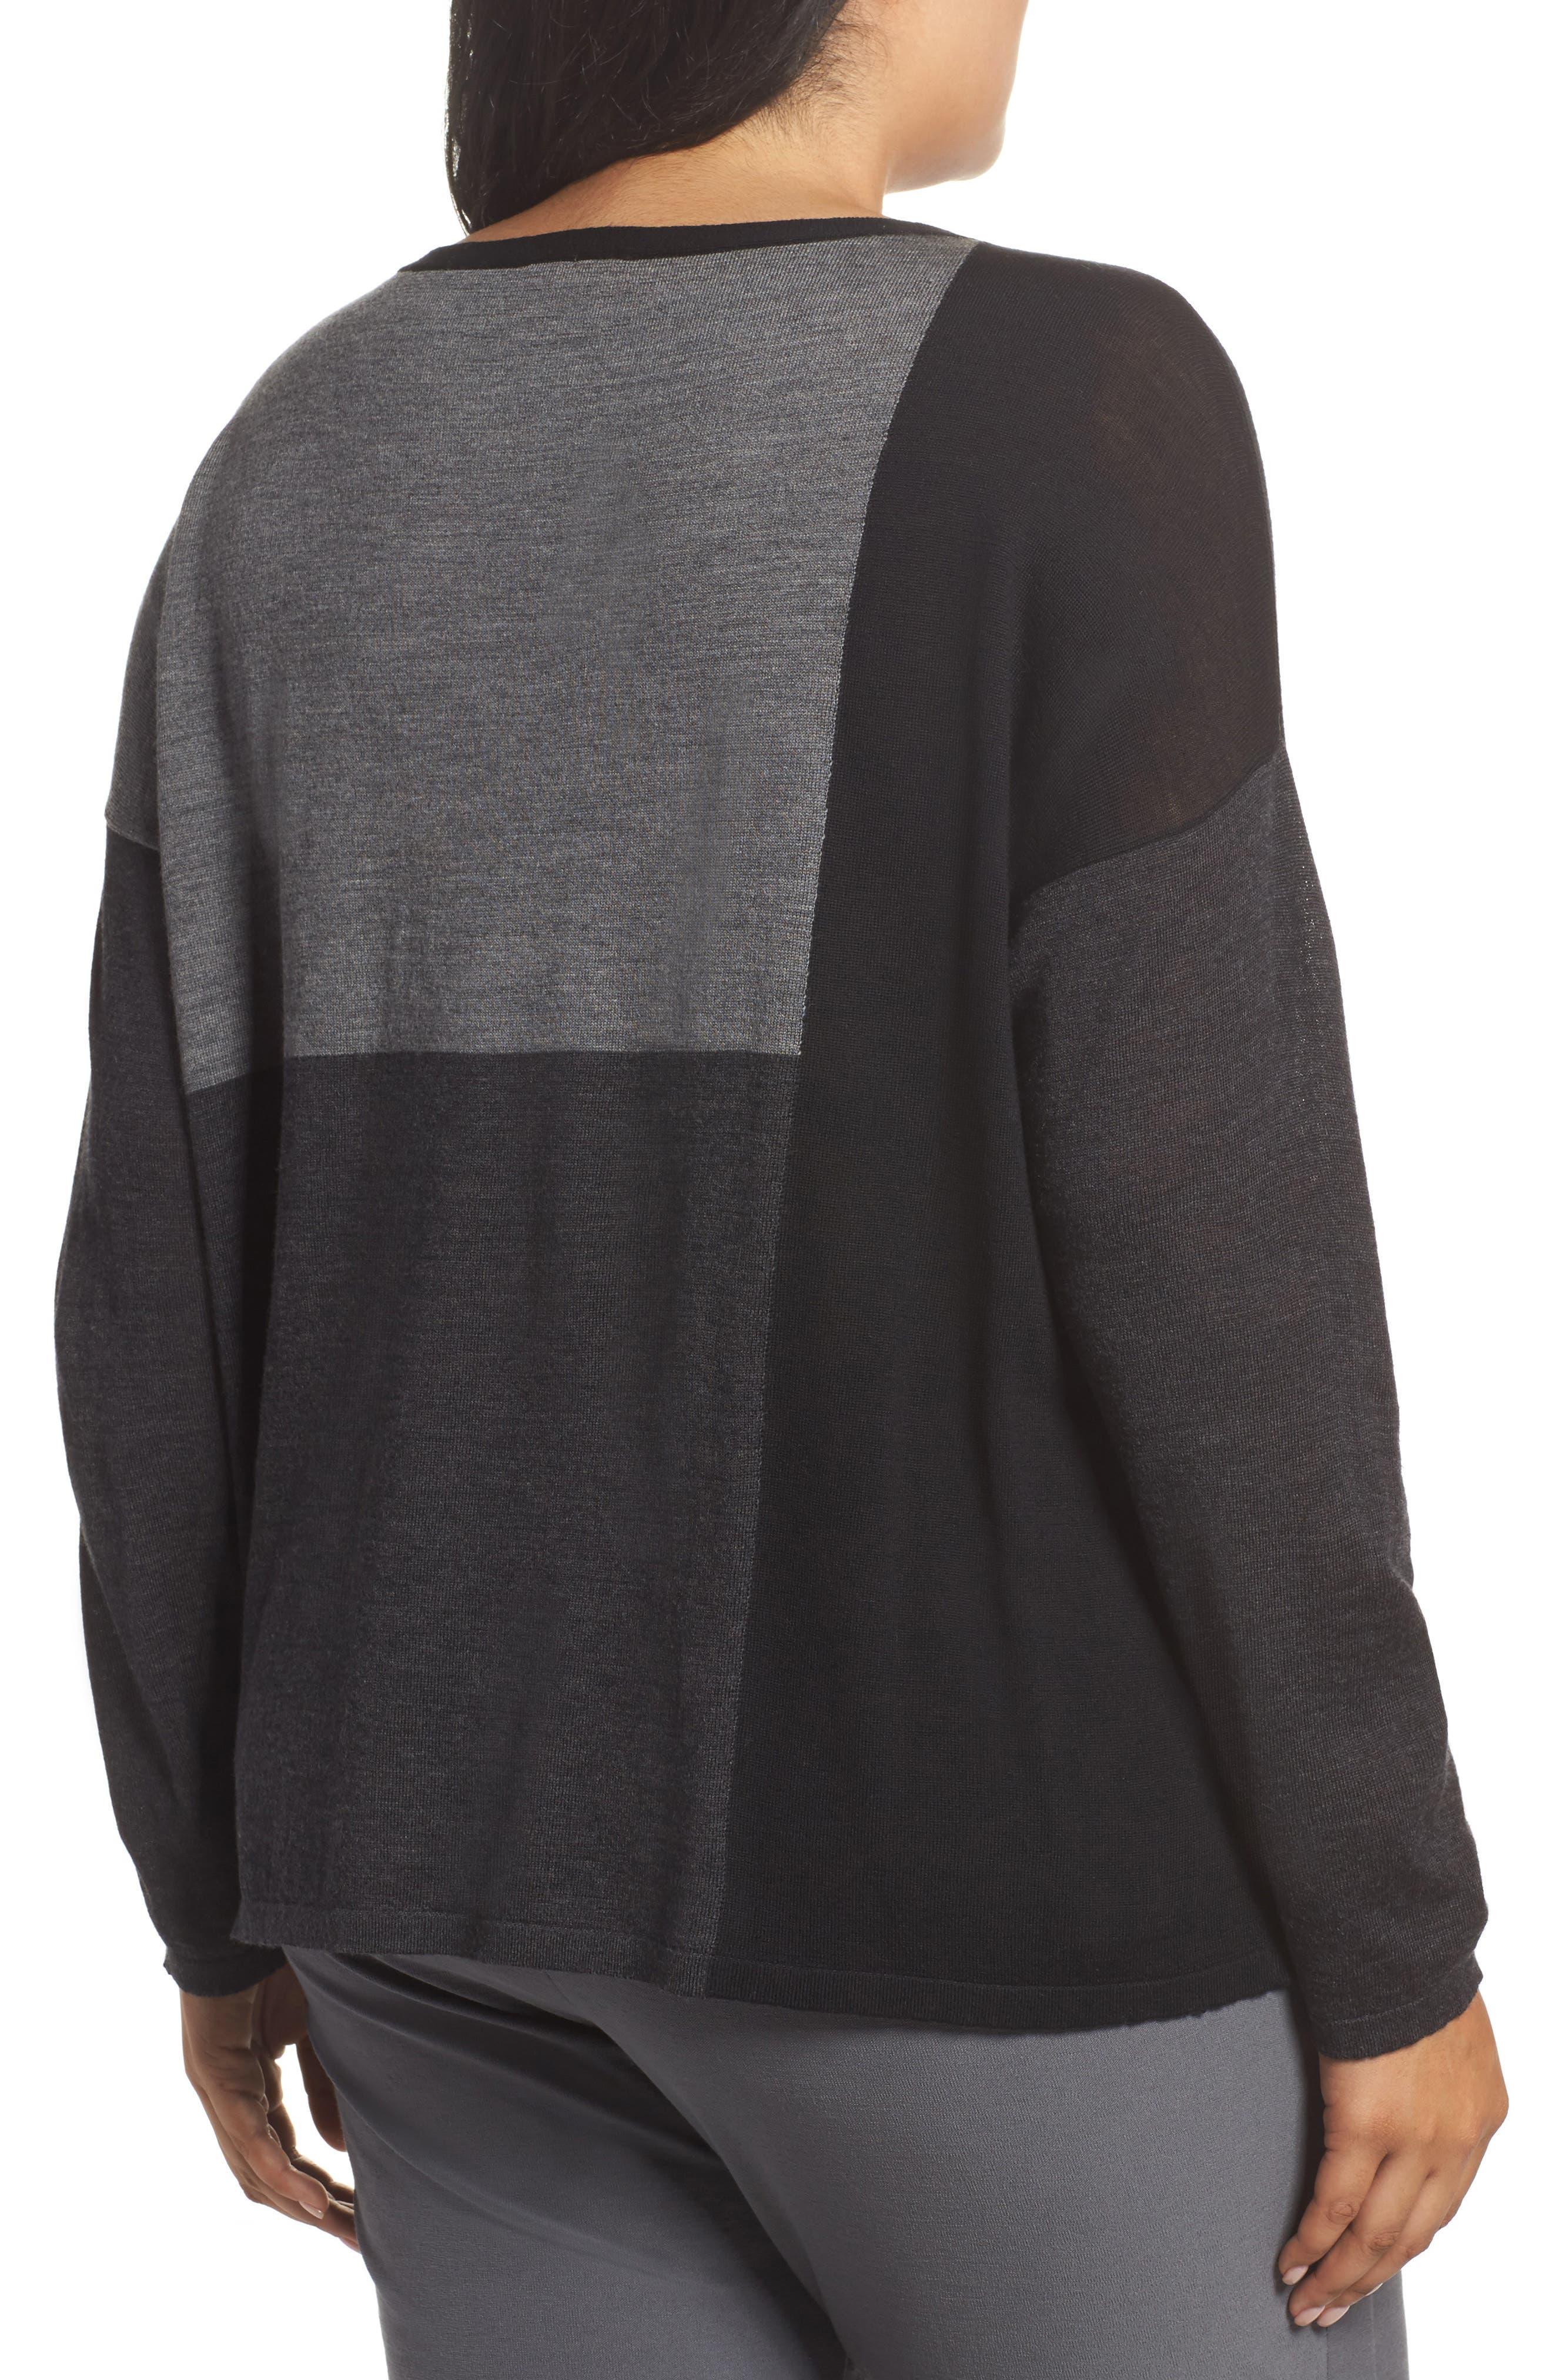 Colorblock Boxy Merino Wool Sweater,                             Alternate thumbnail 2, color,                             021